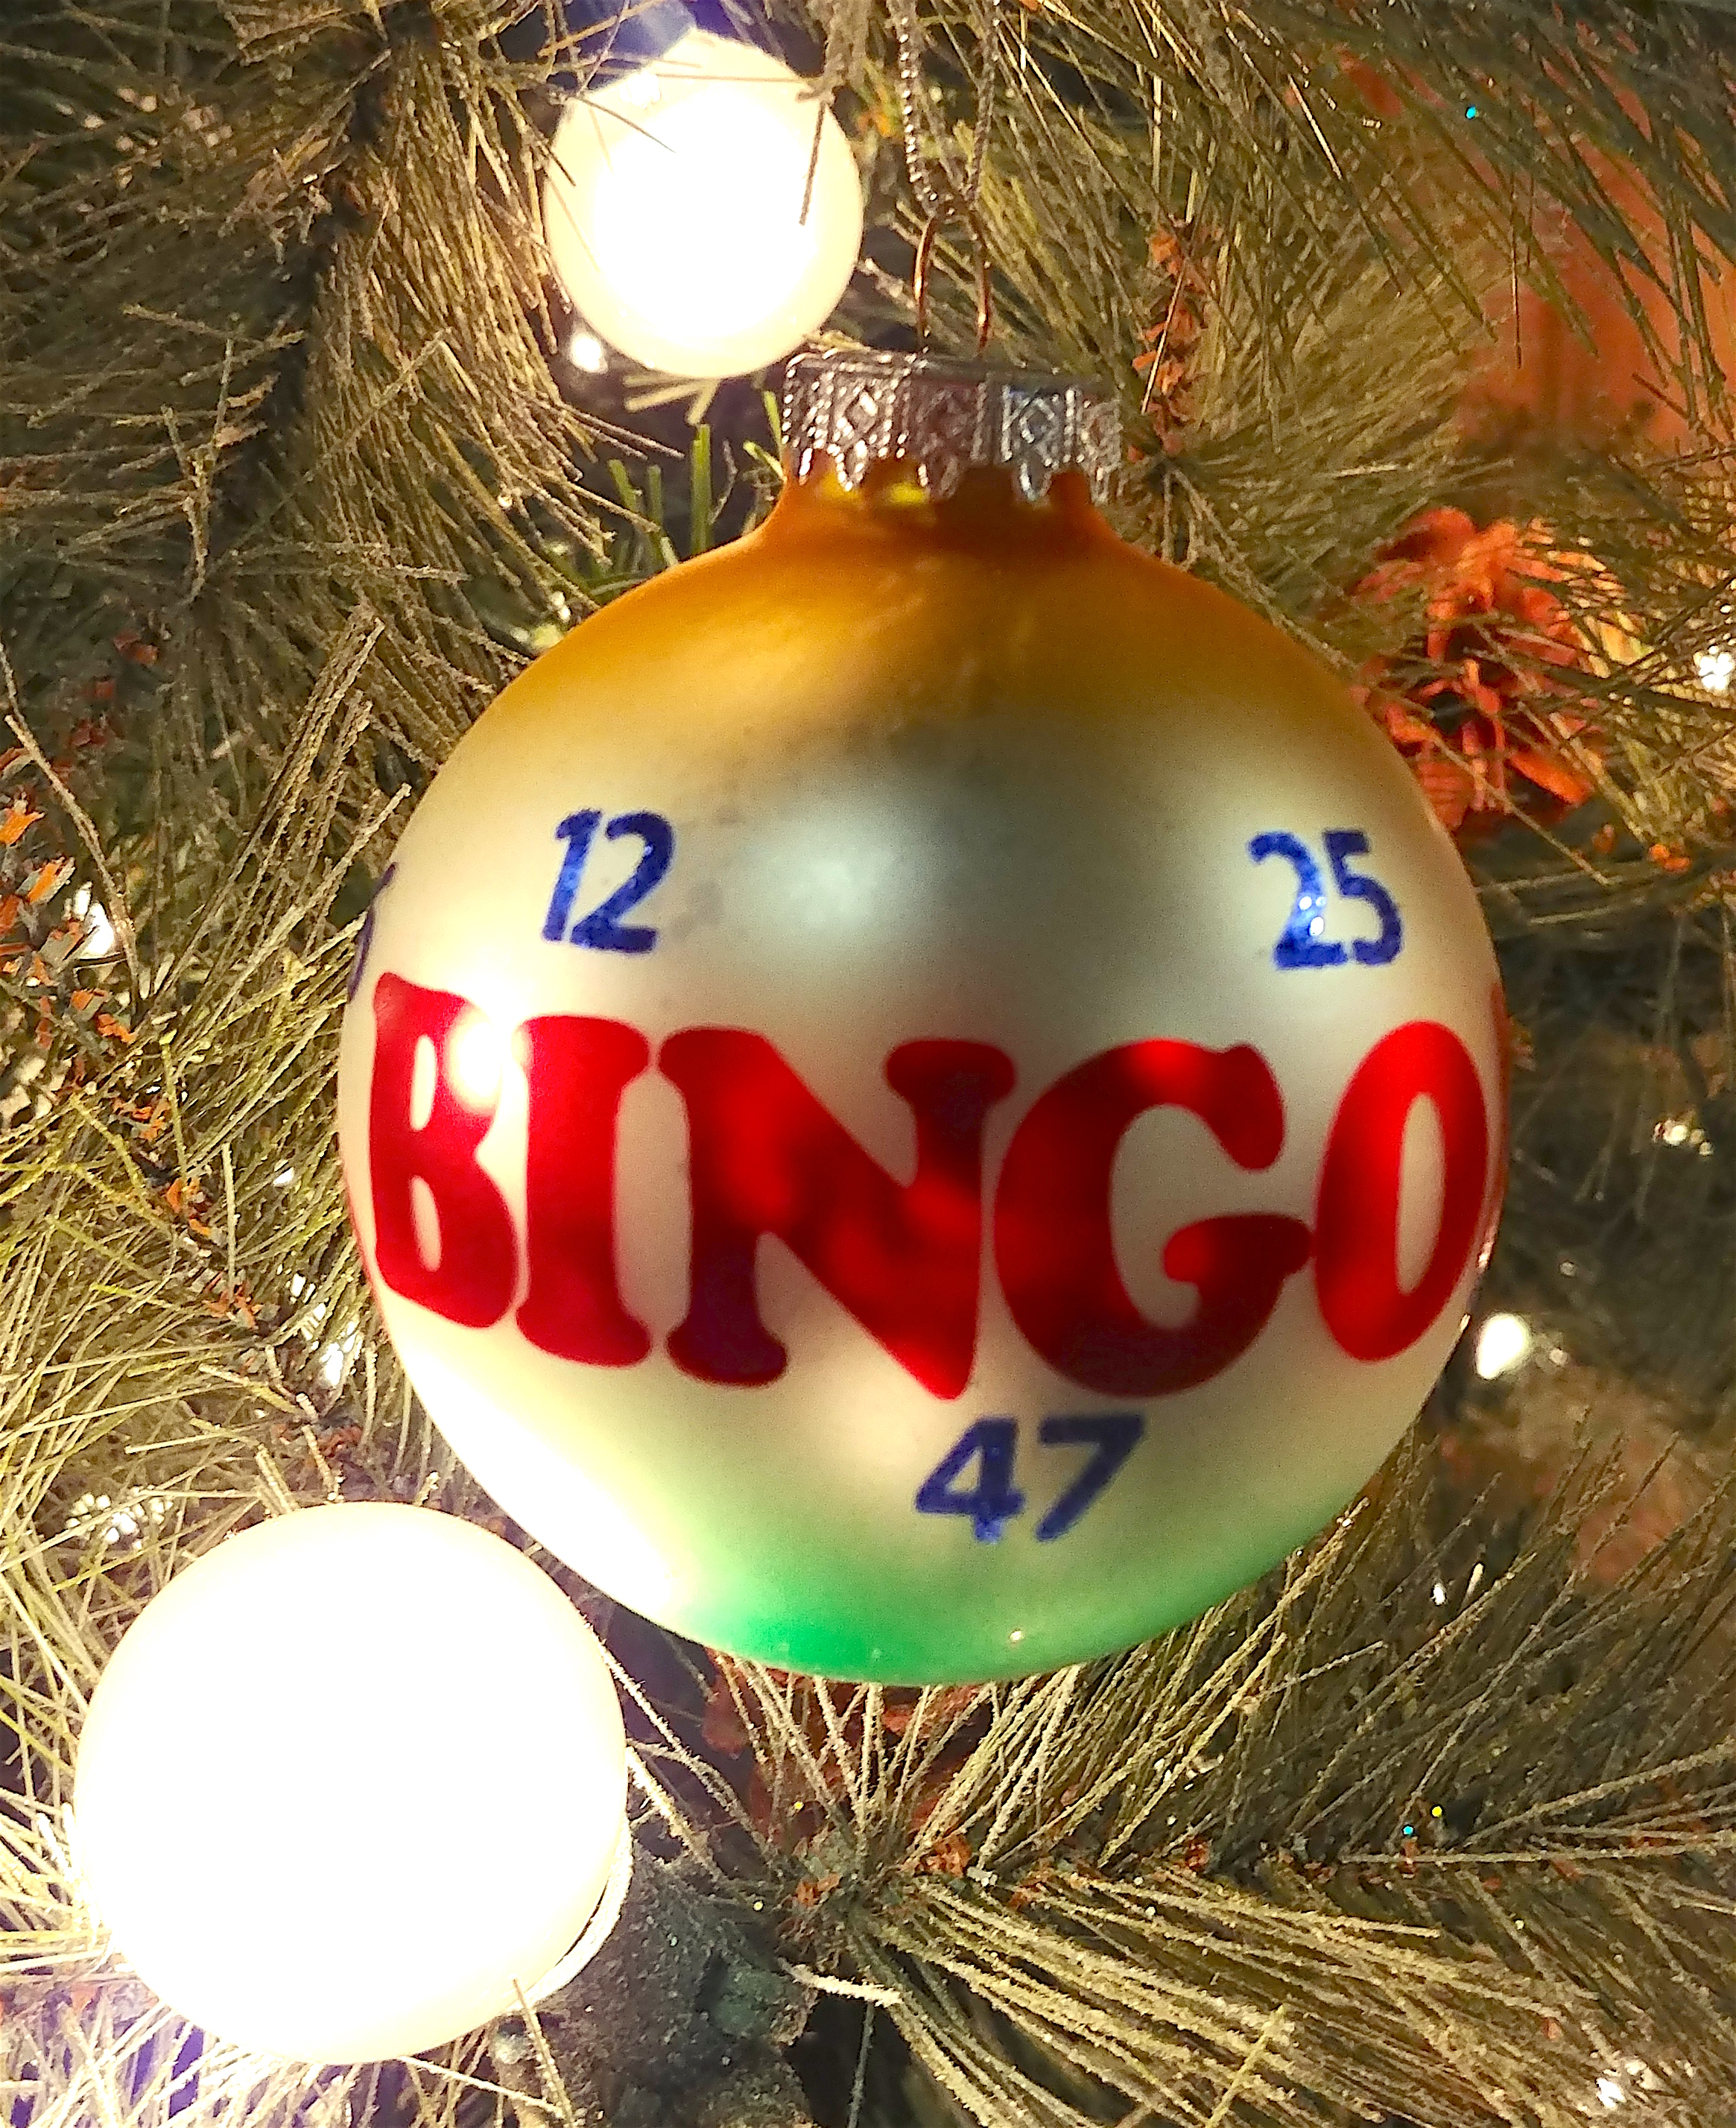 Bingo Glass Ball Ornament - Christmas Store